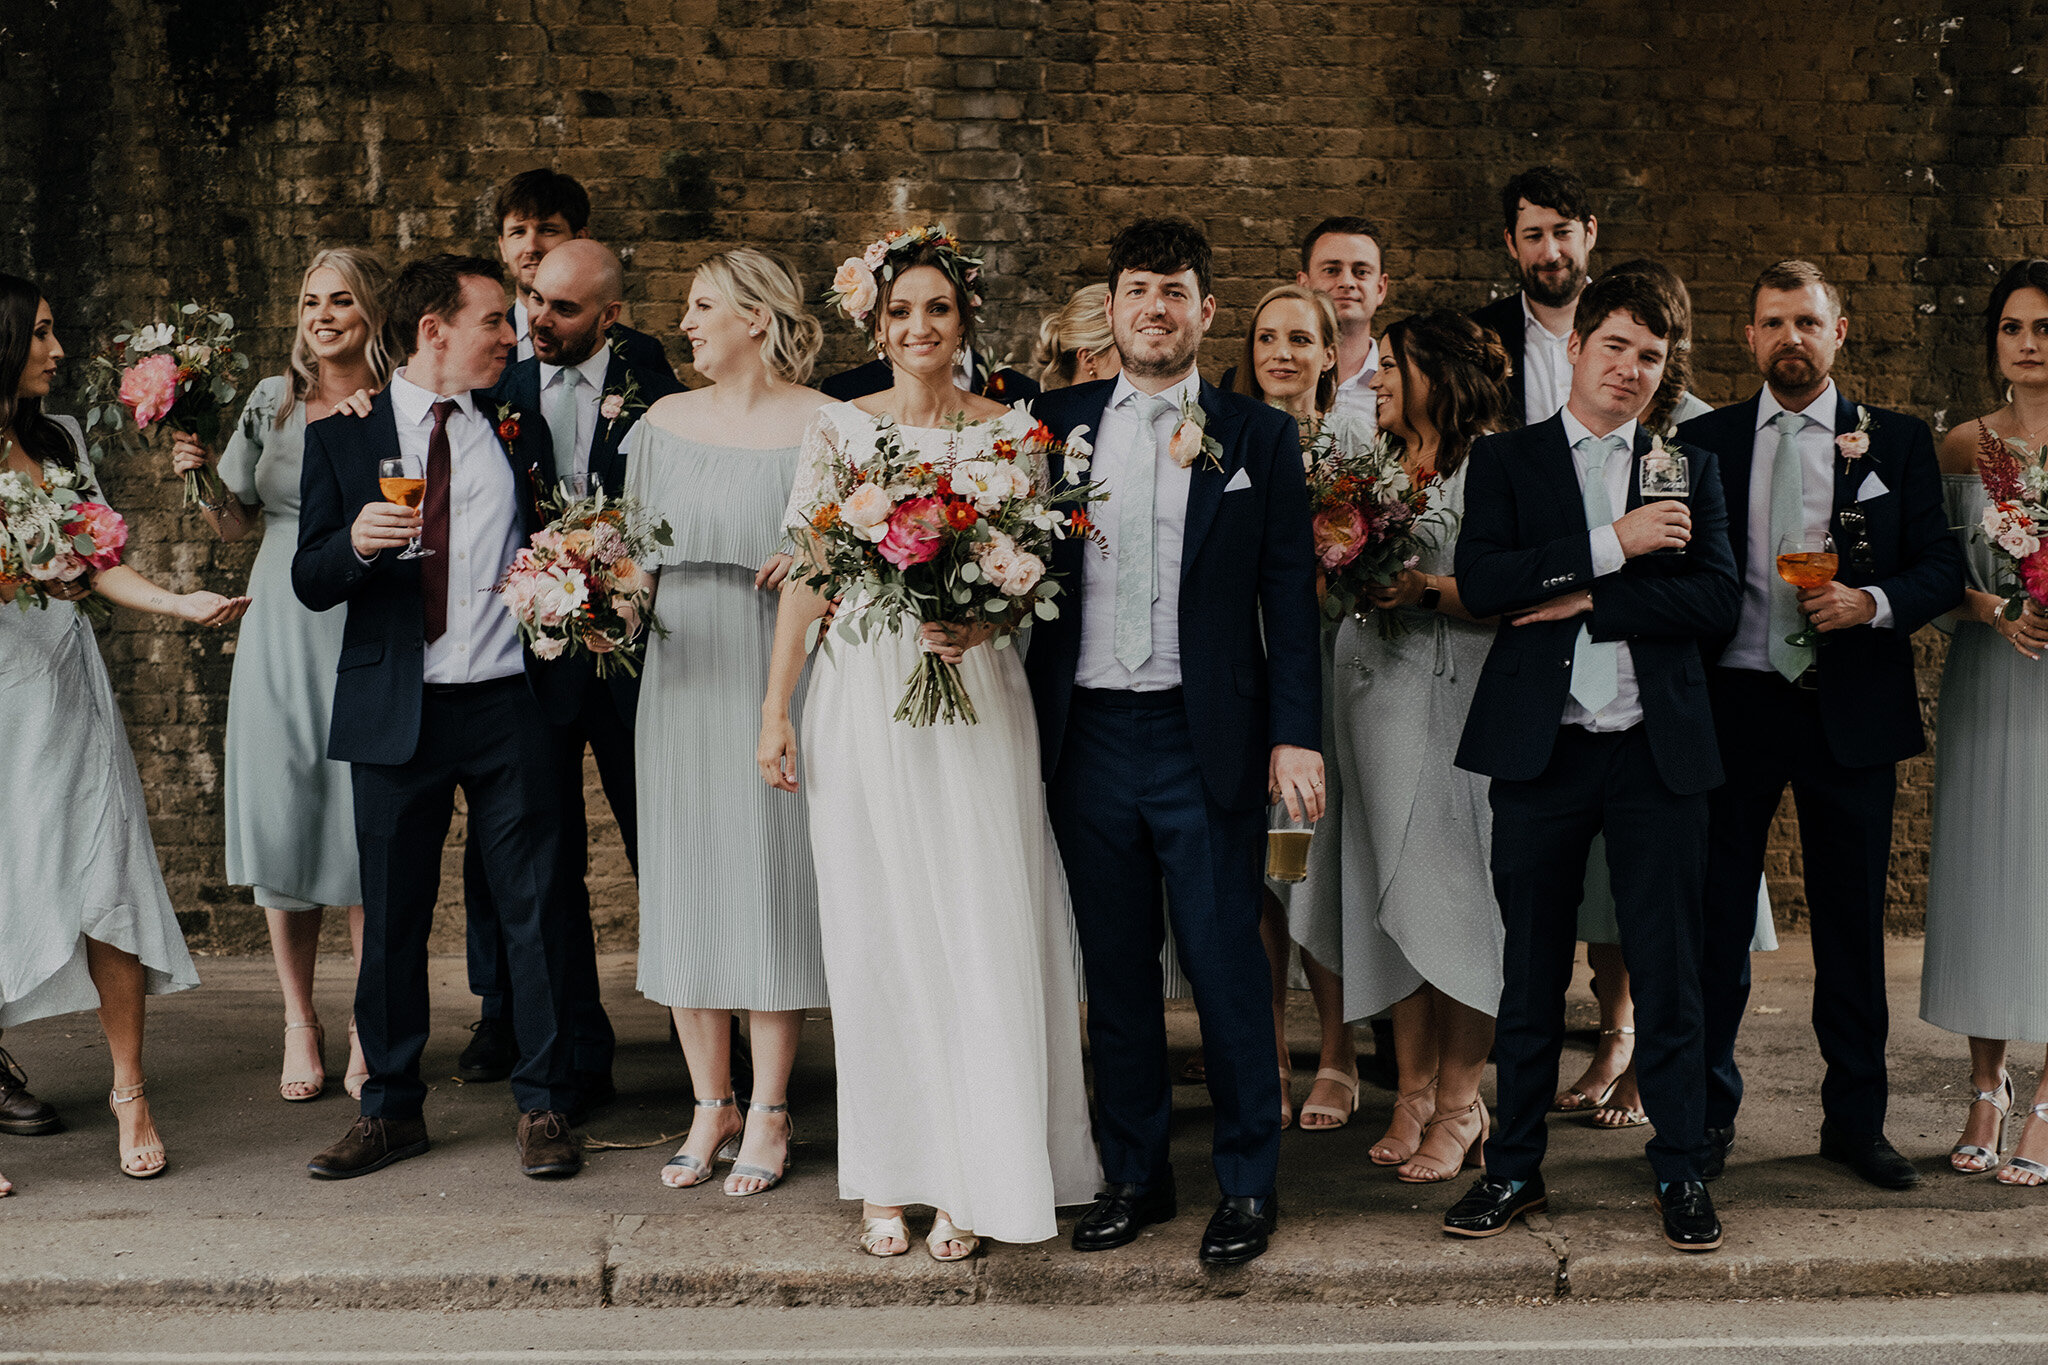 Islington-town-hall-wedding60.jpg